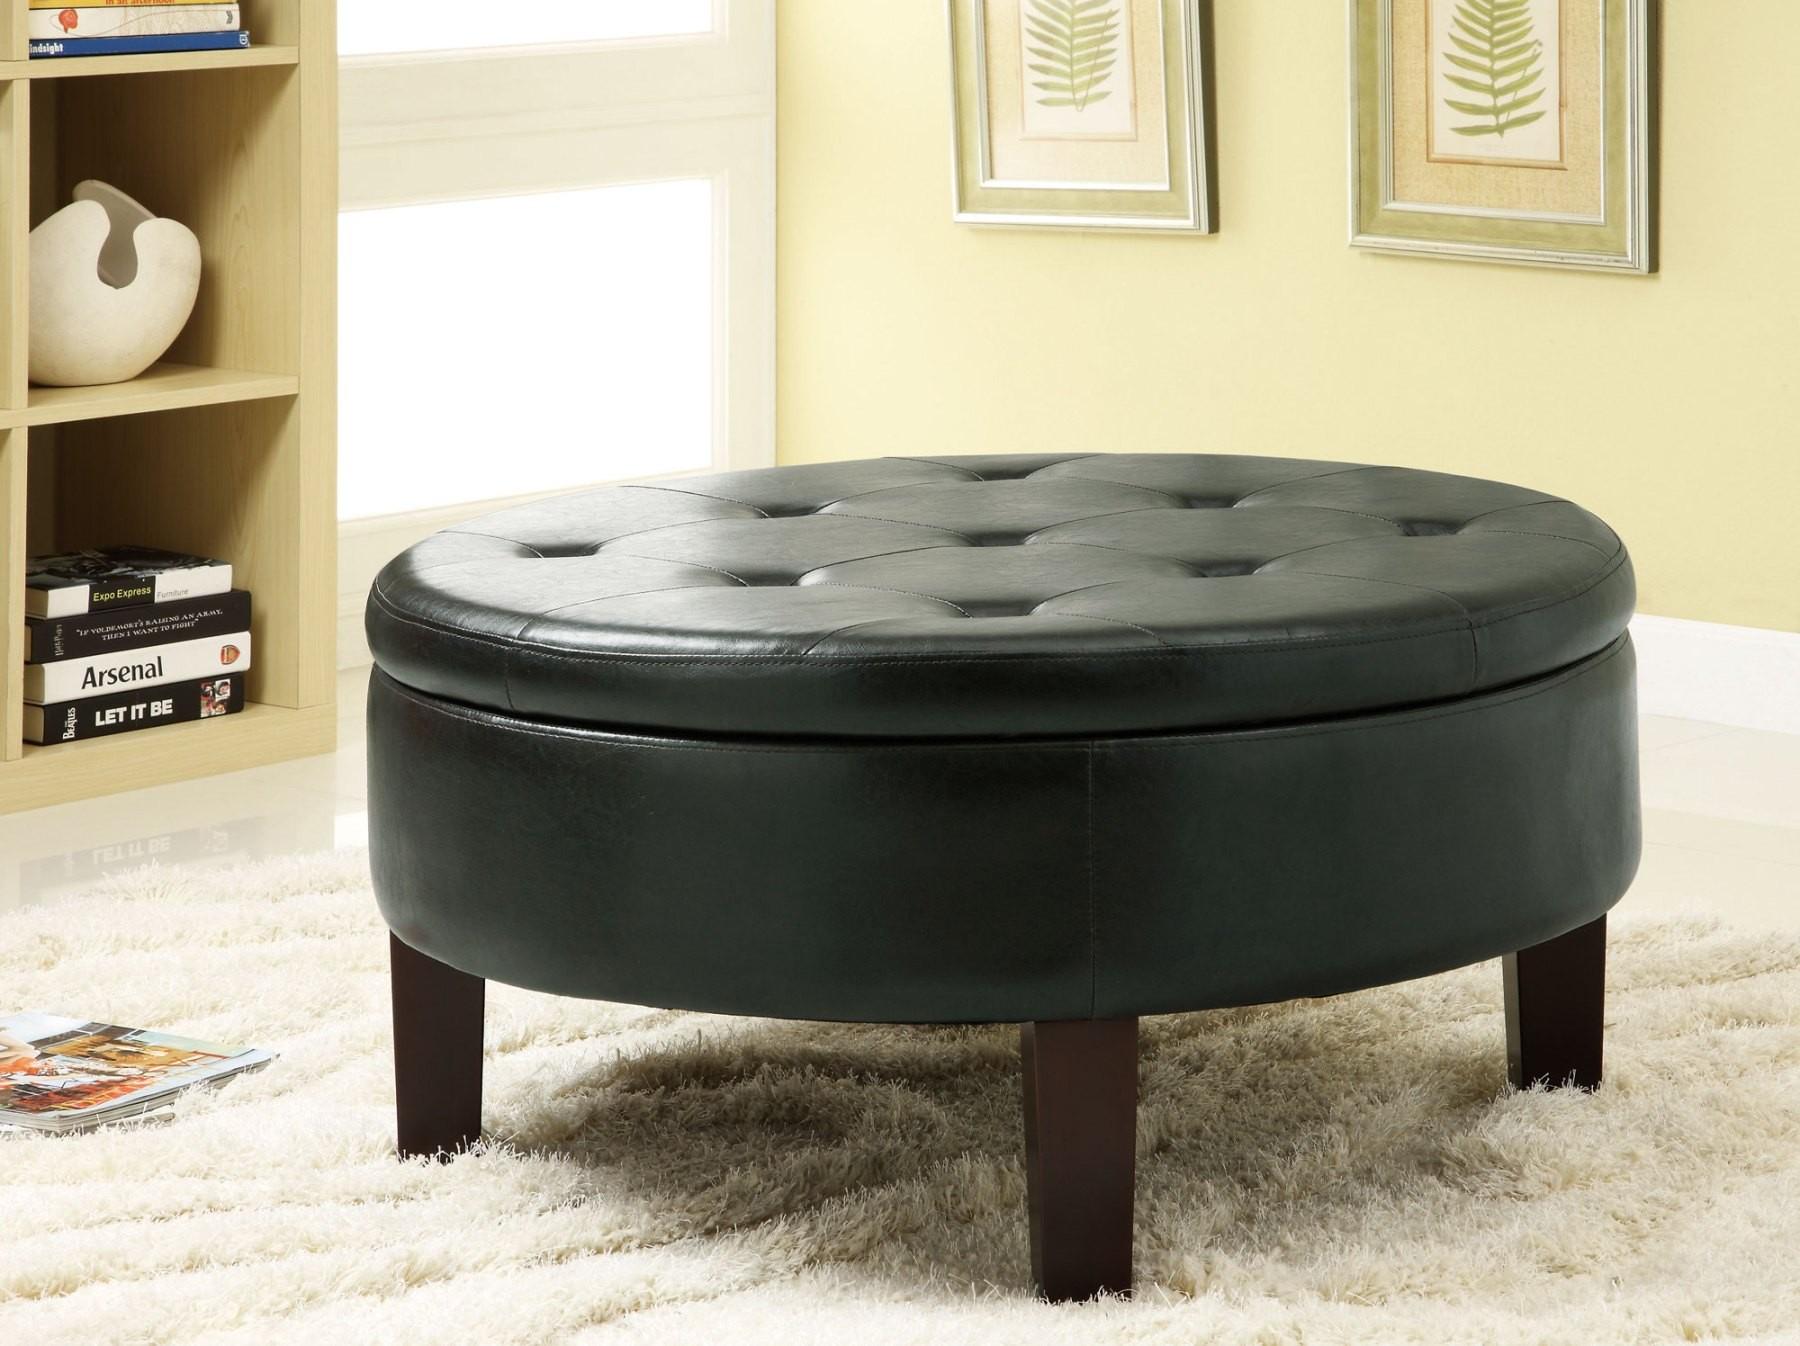 Round Storage Ottoman Coffee Table Round Padded Coffee Table Upholstered Coffee Tables Ottomans (View 9 of 10)